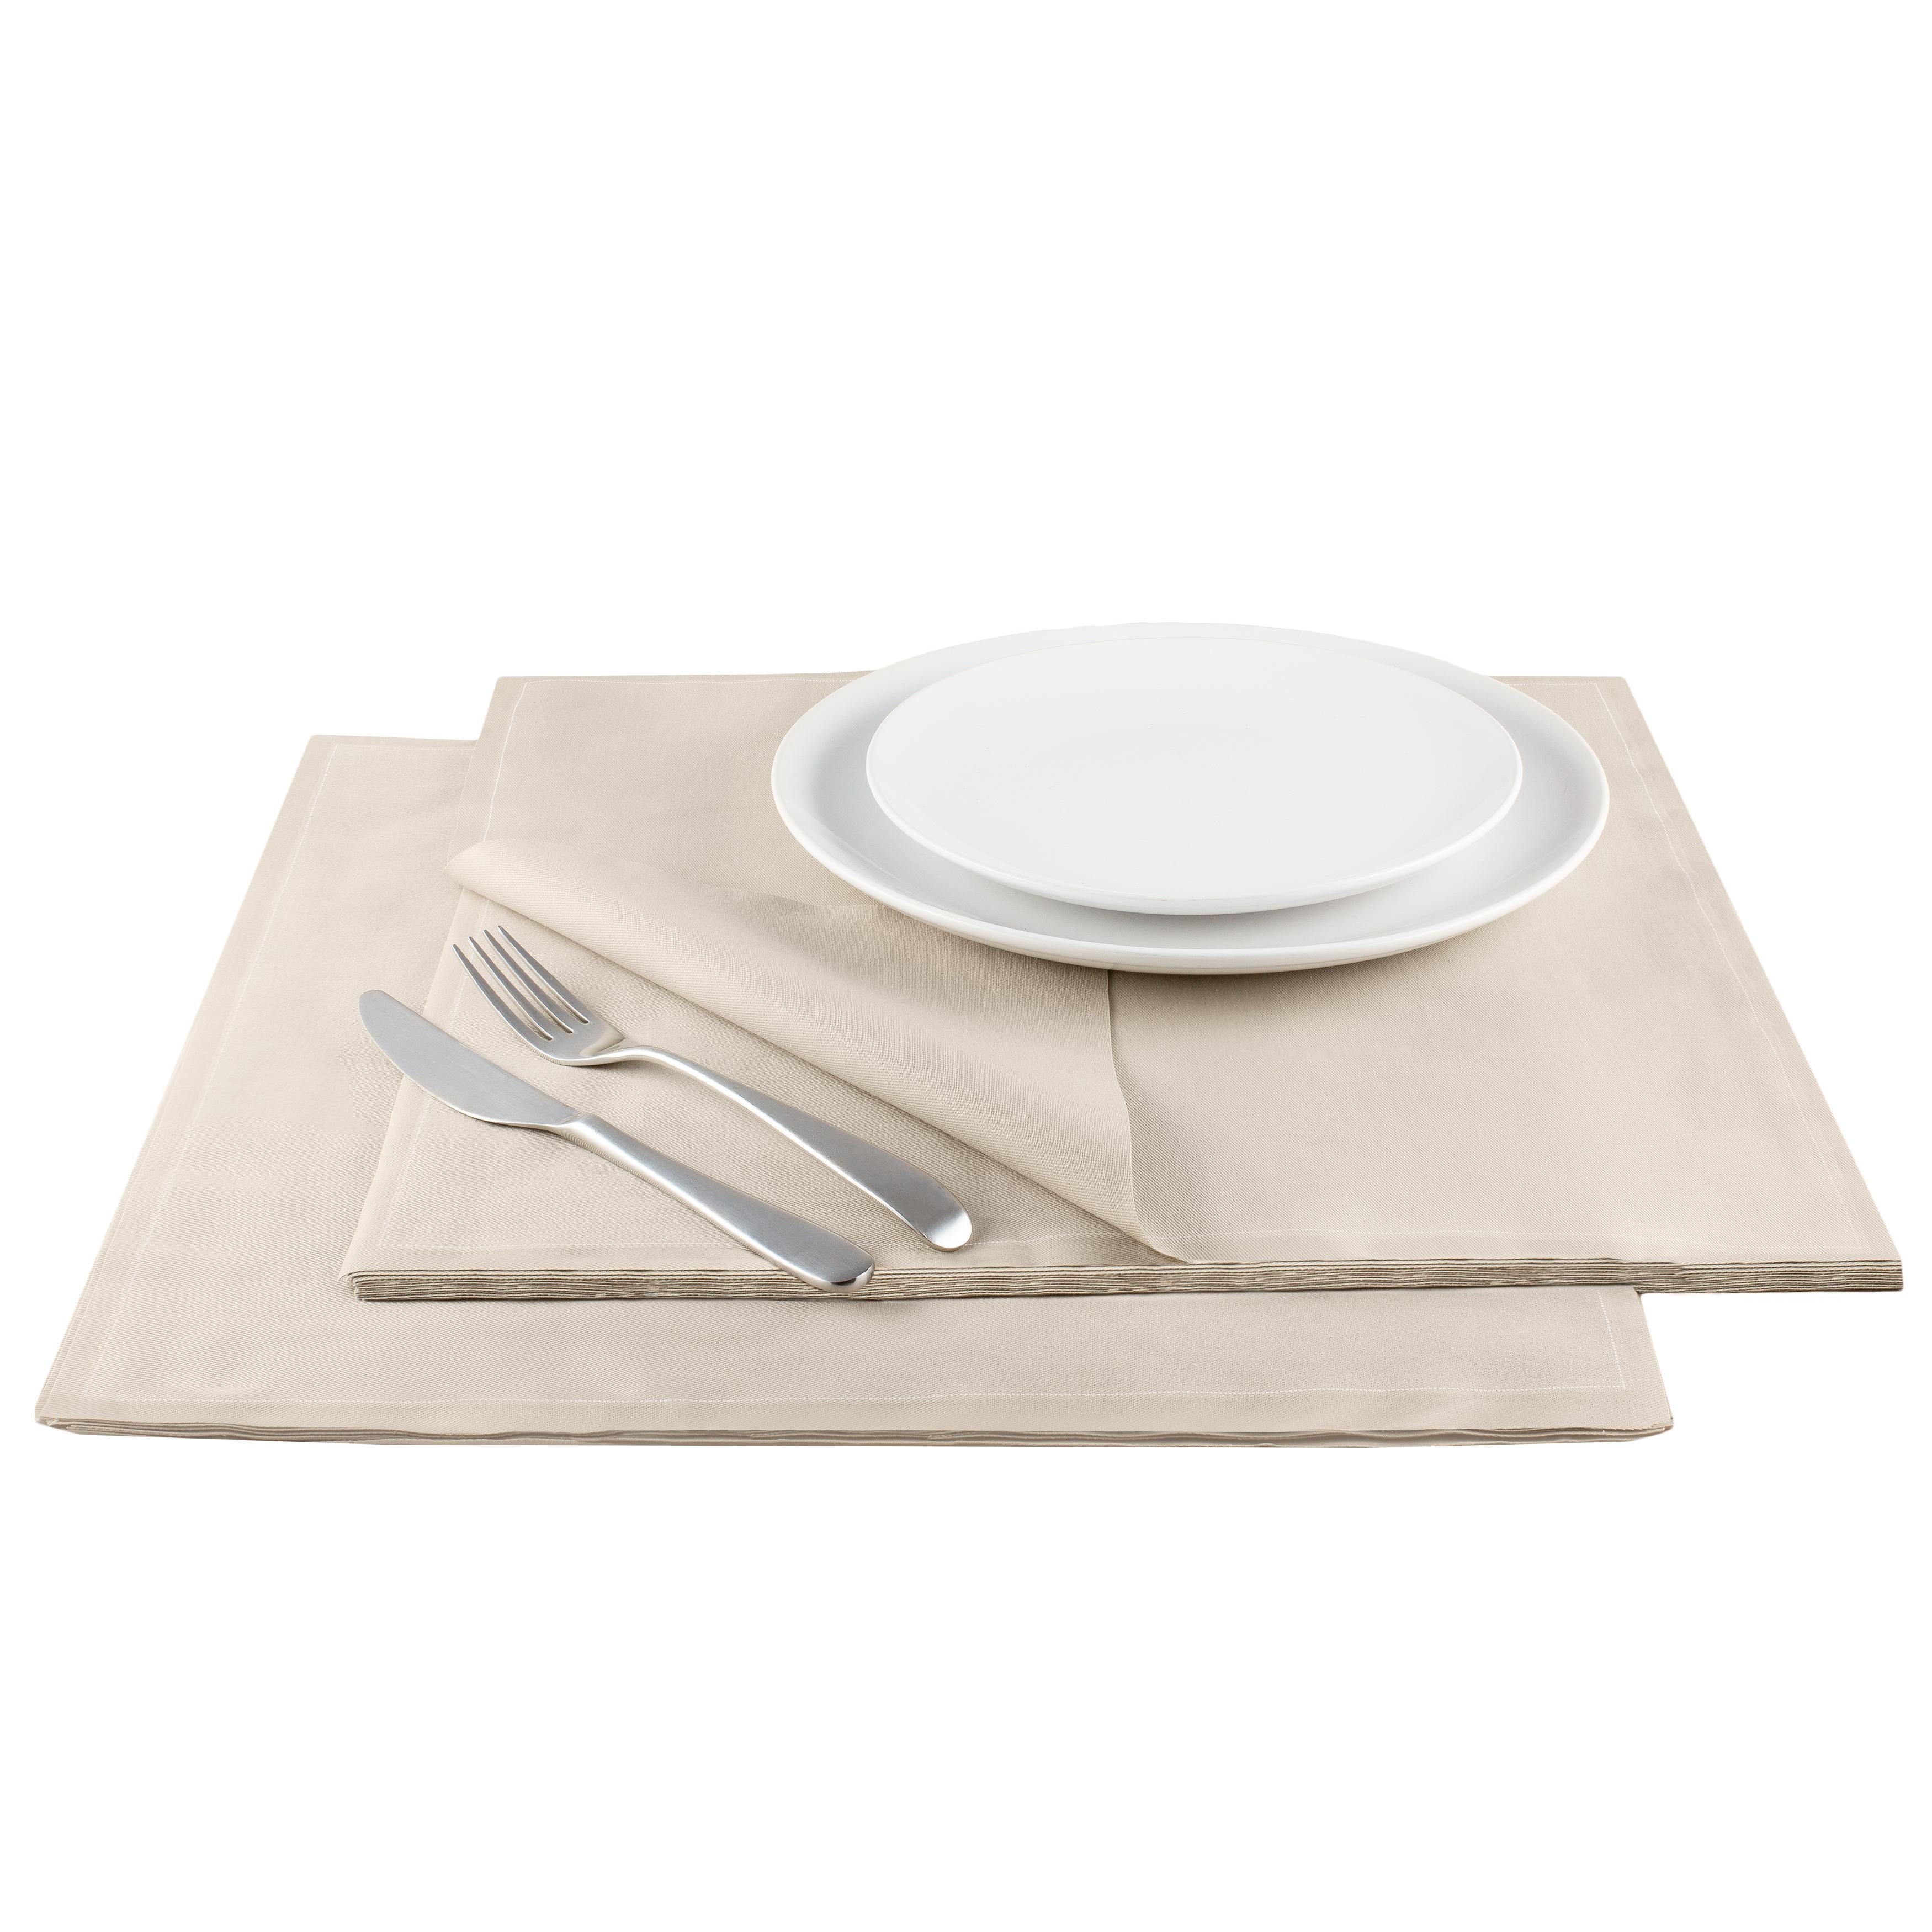 "Sand Cotton Premium Dinner (200 GSM) - 15.8"" x 15.8"" - 250 Units"